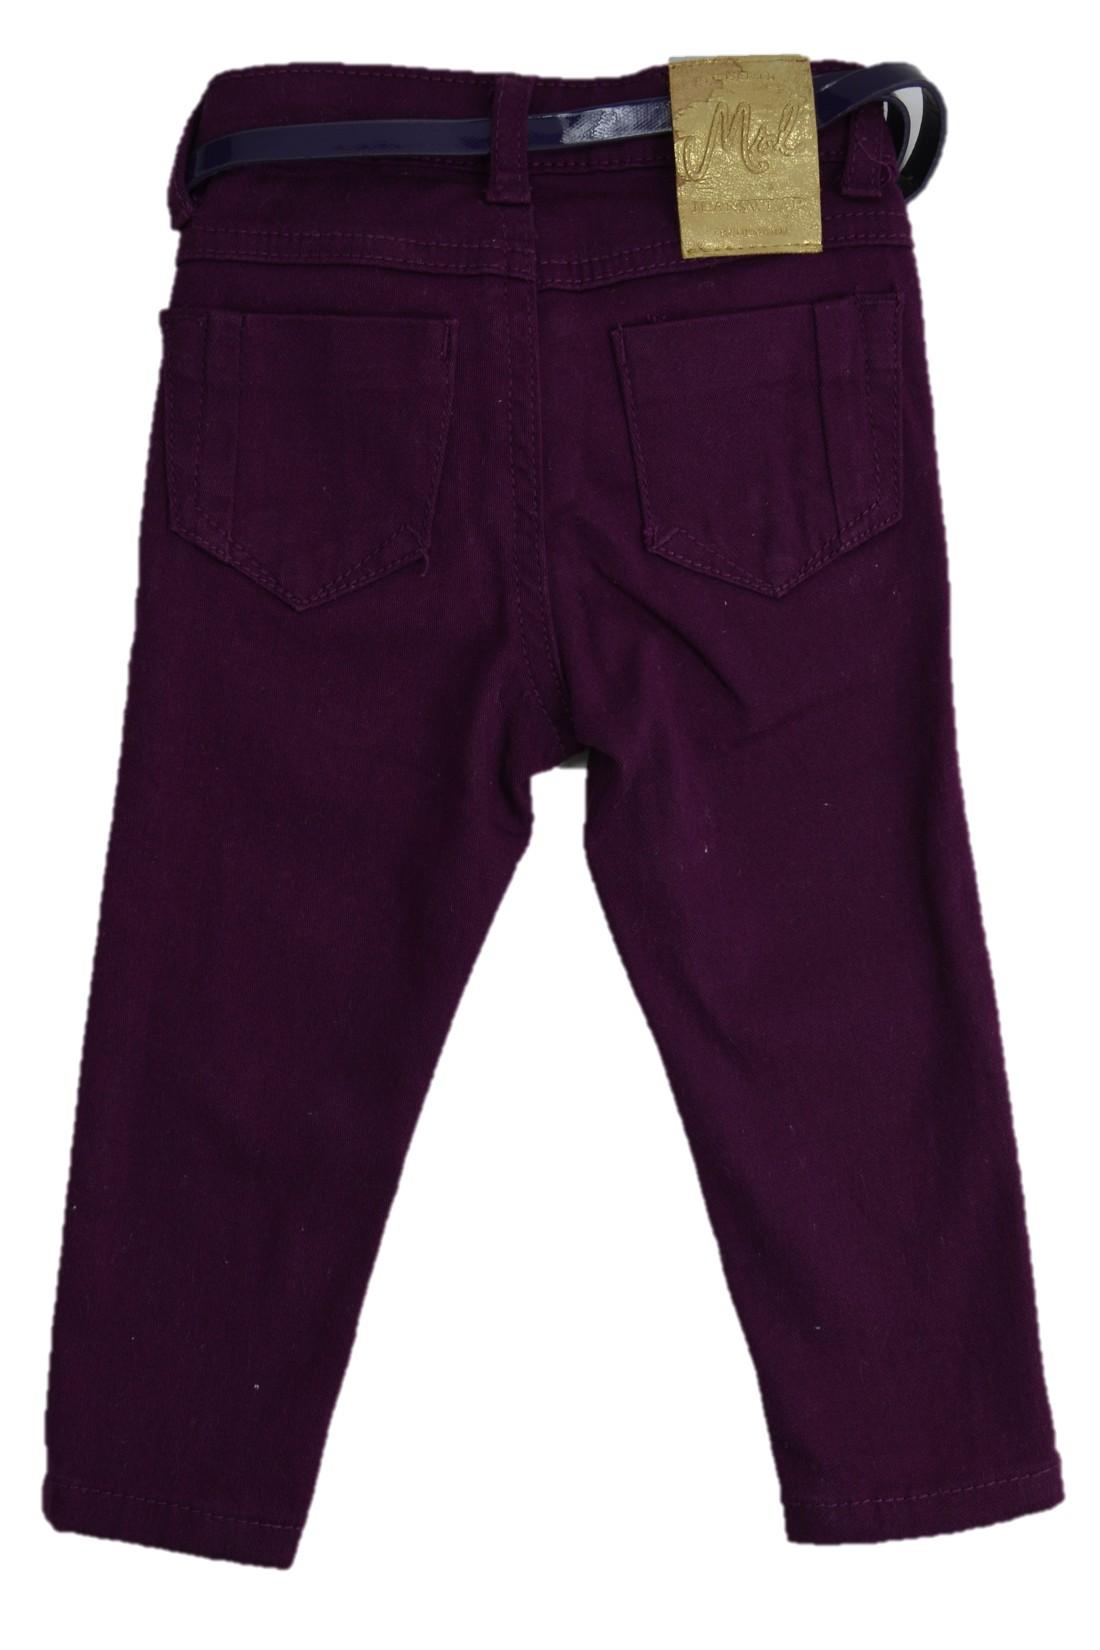 Foto2 - Calça Color Jeans | Marisol